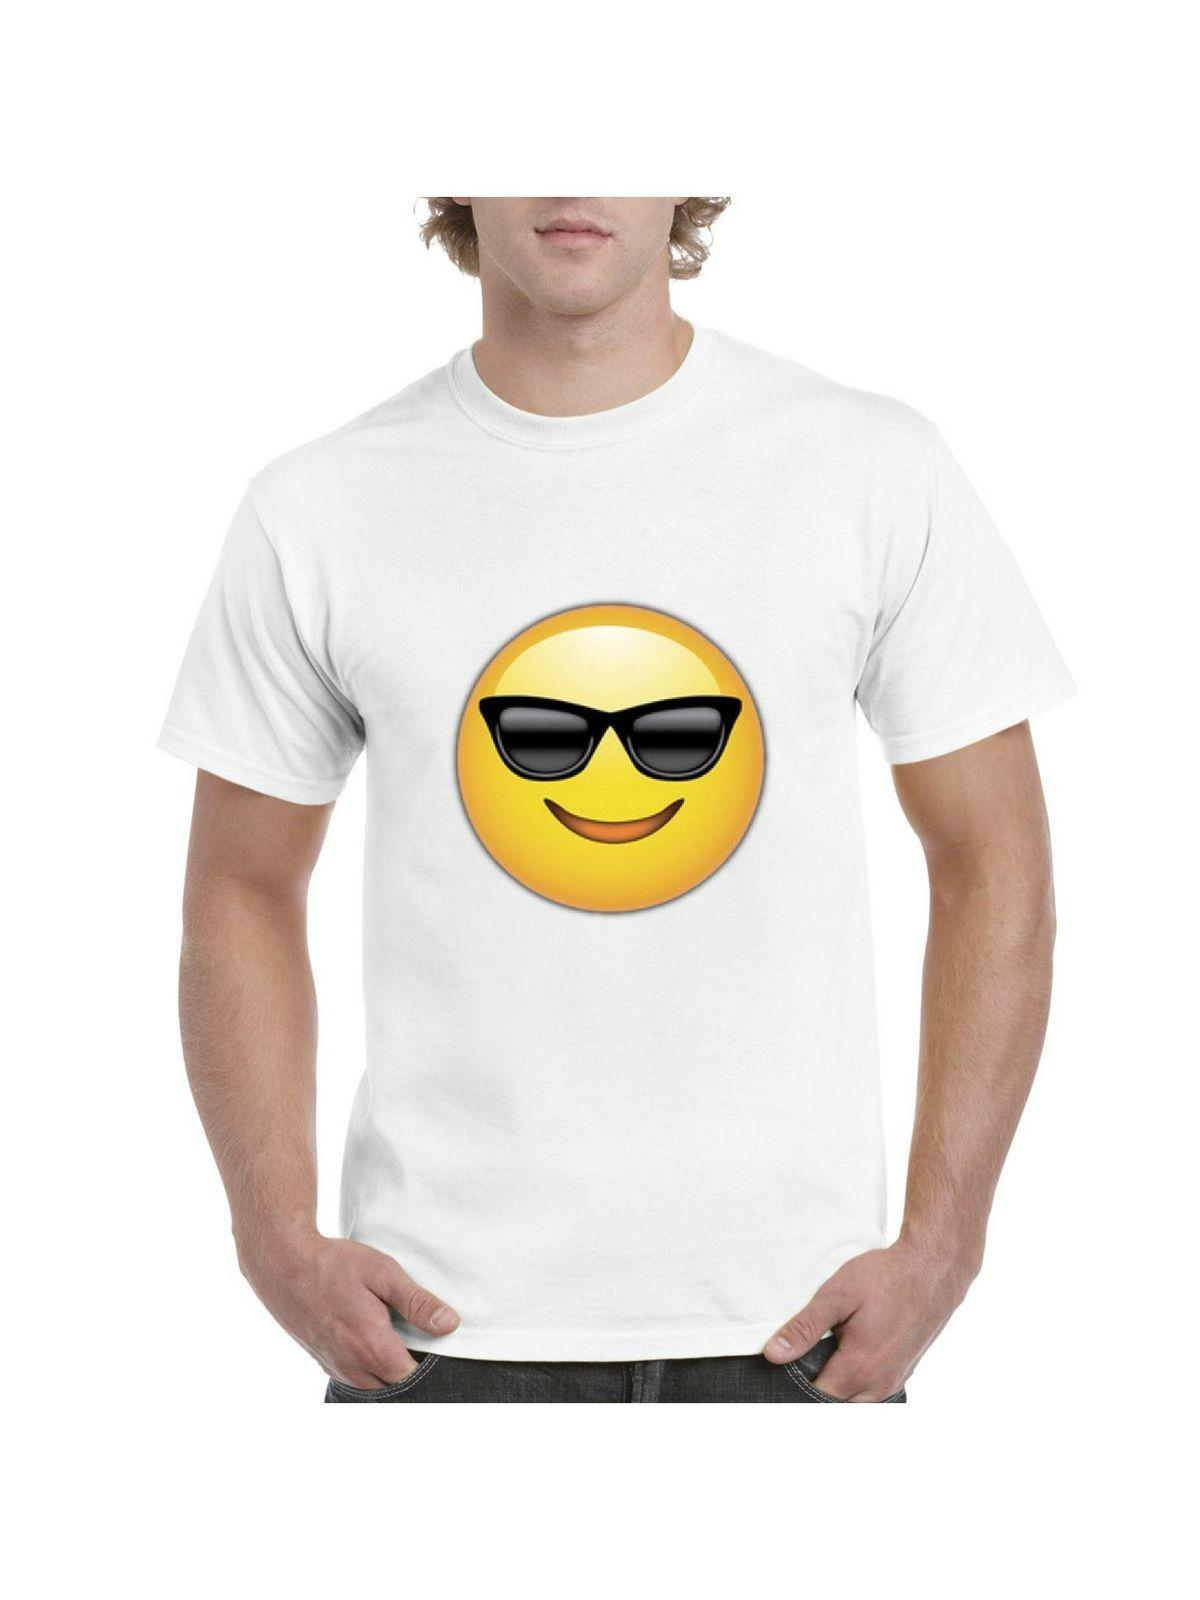 emojis t shirt cool smiling face w sunglasses mens shirts cotton men t shirts classical top tee basic models online t shirt shopping print on t shirt from